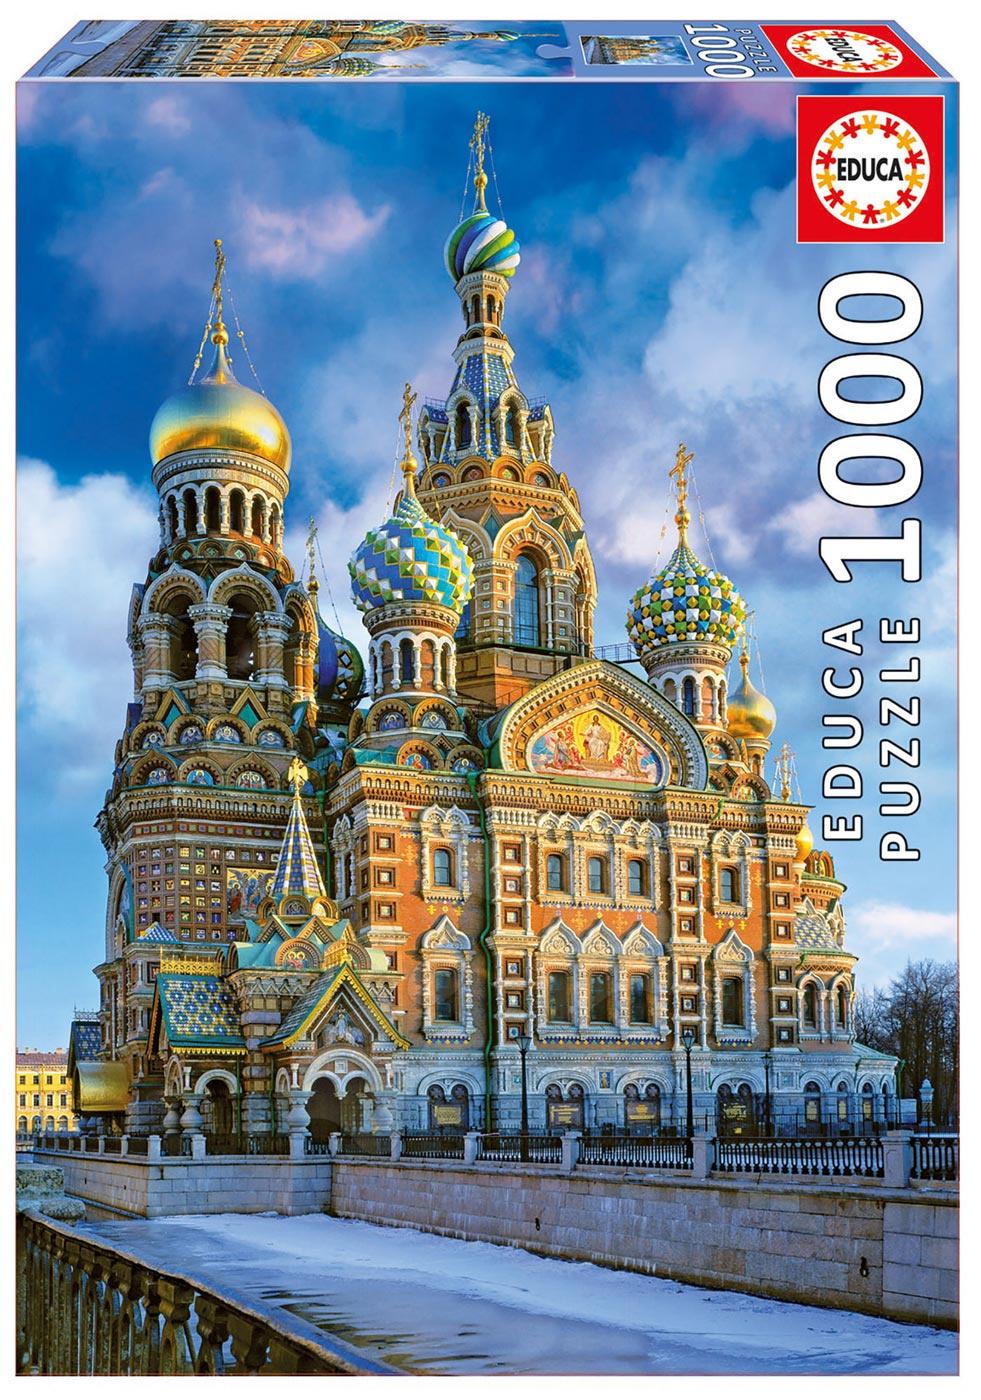 Puzzle 1000 dielne - Puzzle Genuine Church of the Resurrection of Christ, St Petersburg Educa 1000 dielov od 12 rokov